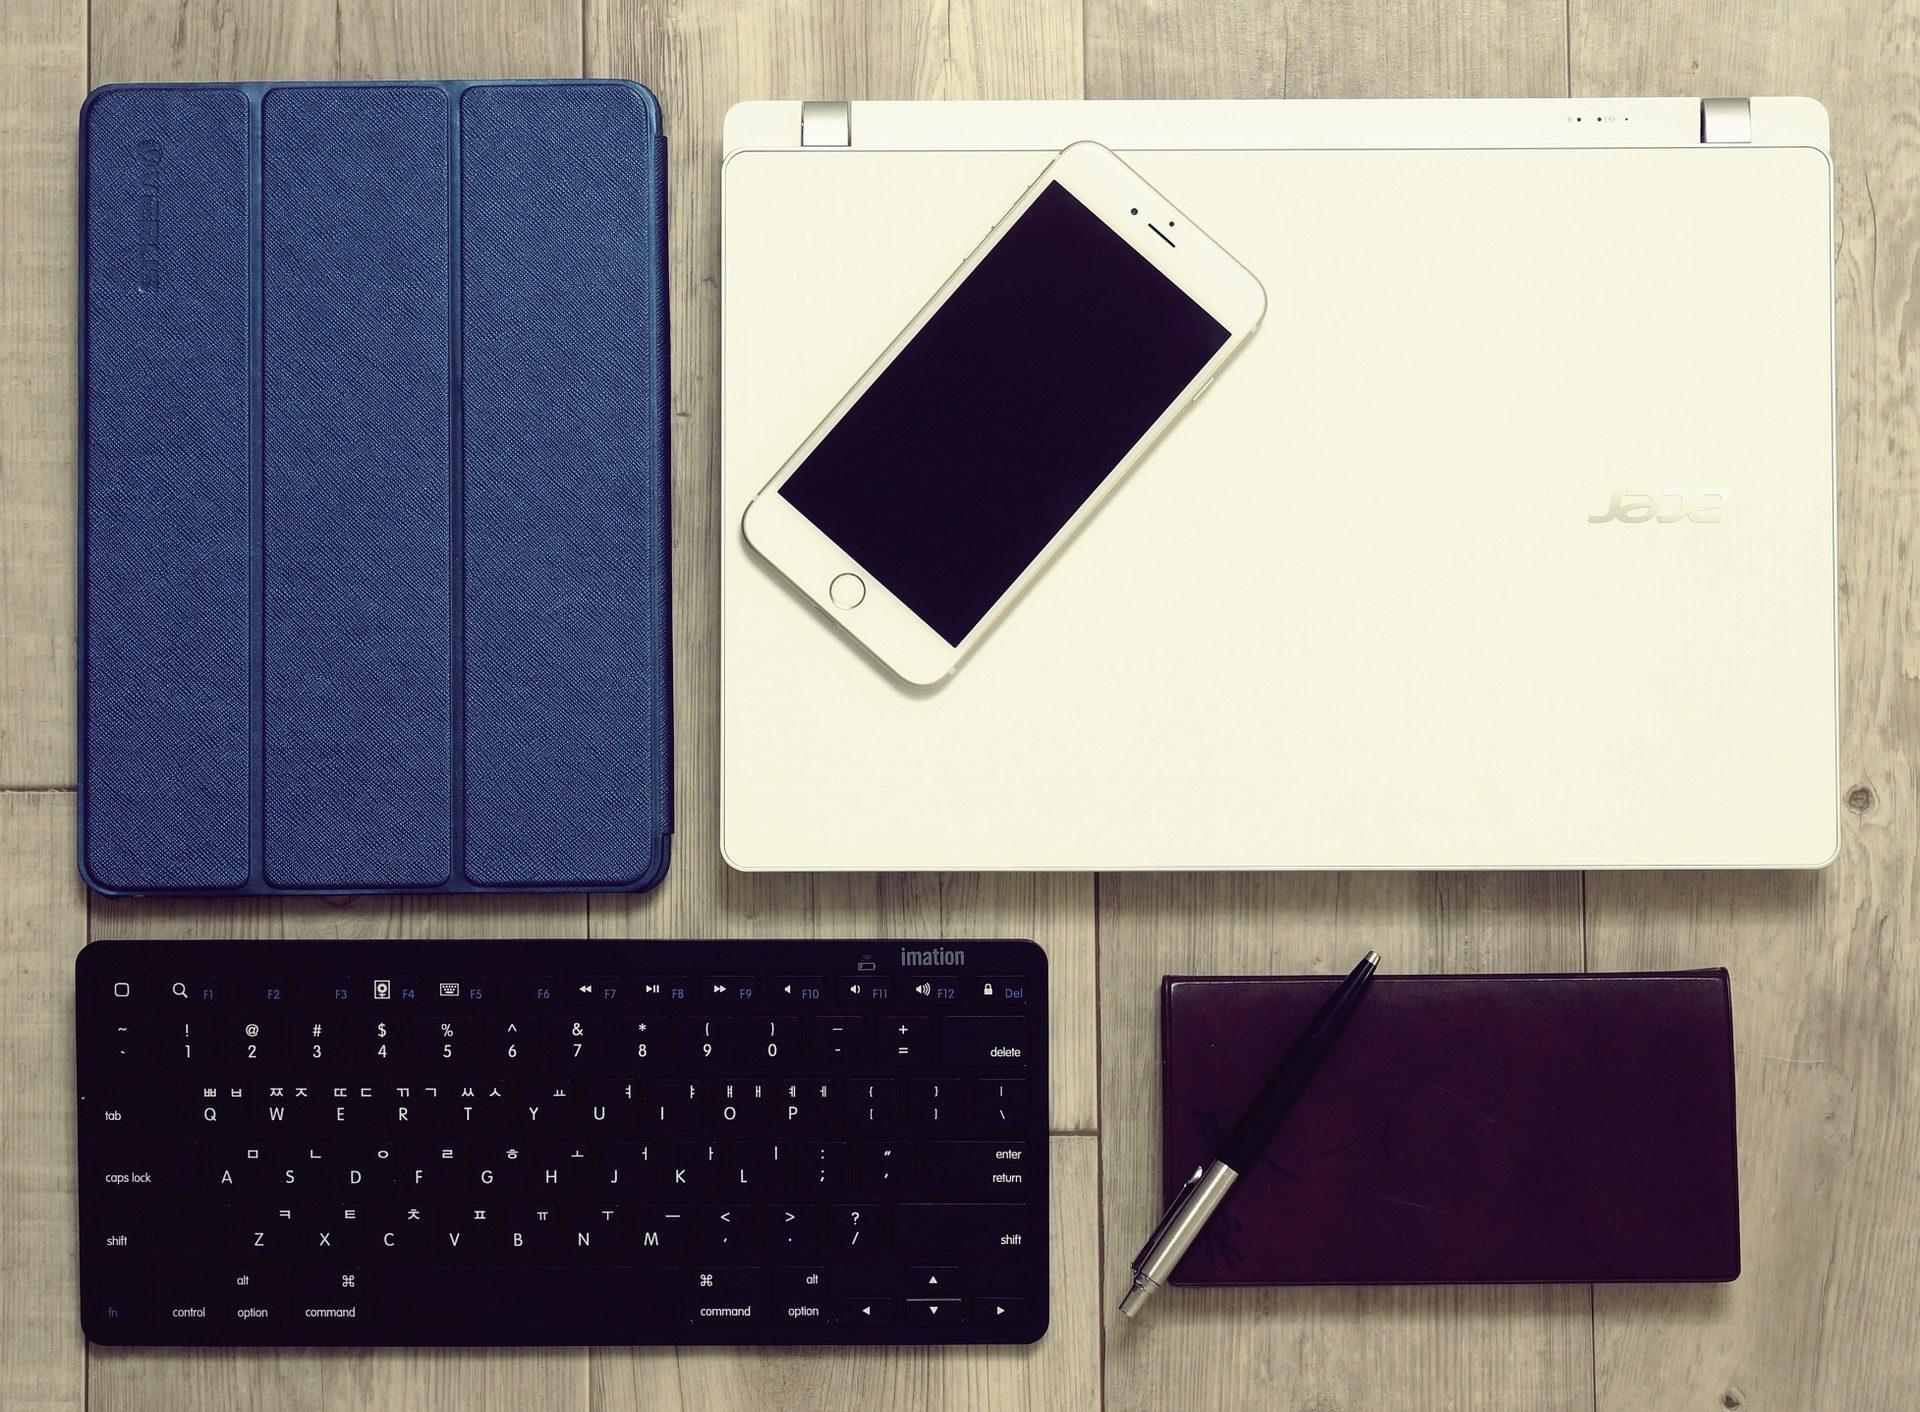 oficina, ordenador, portátil, teléfono, móvil, teclado, tablet, negocios - Fondos de Pantalla HD - professor-falken.com